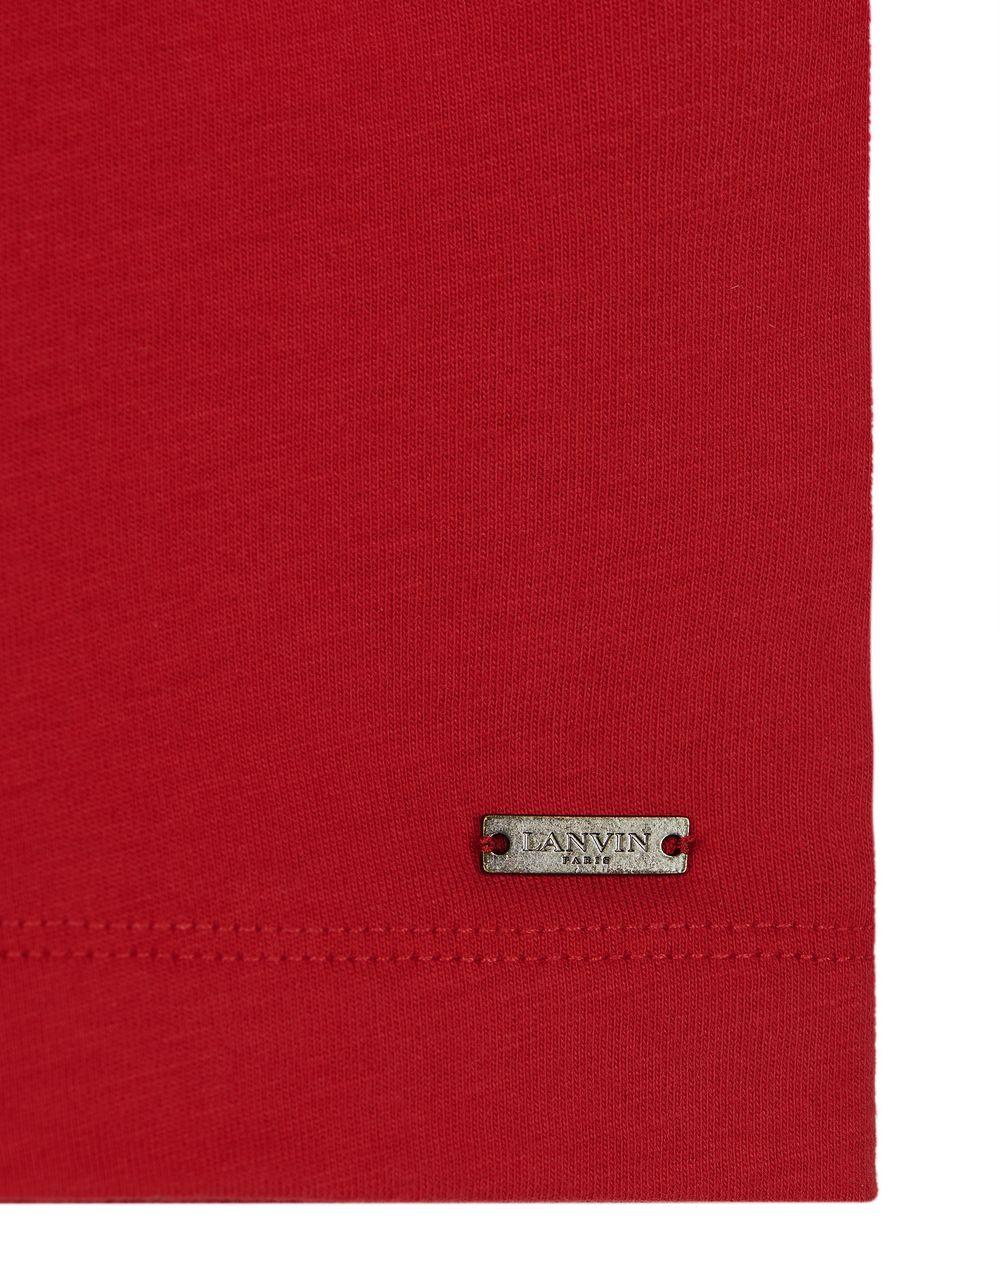 RED PRINT T-SHIRT - Lanvin